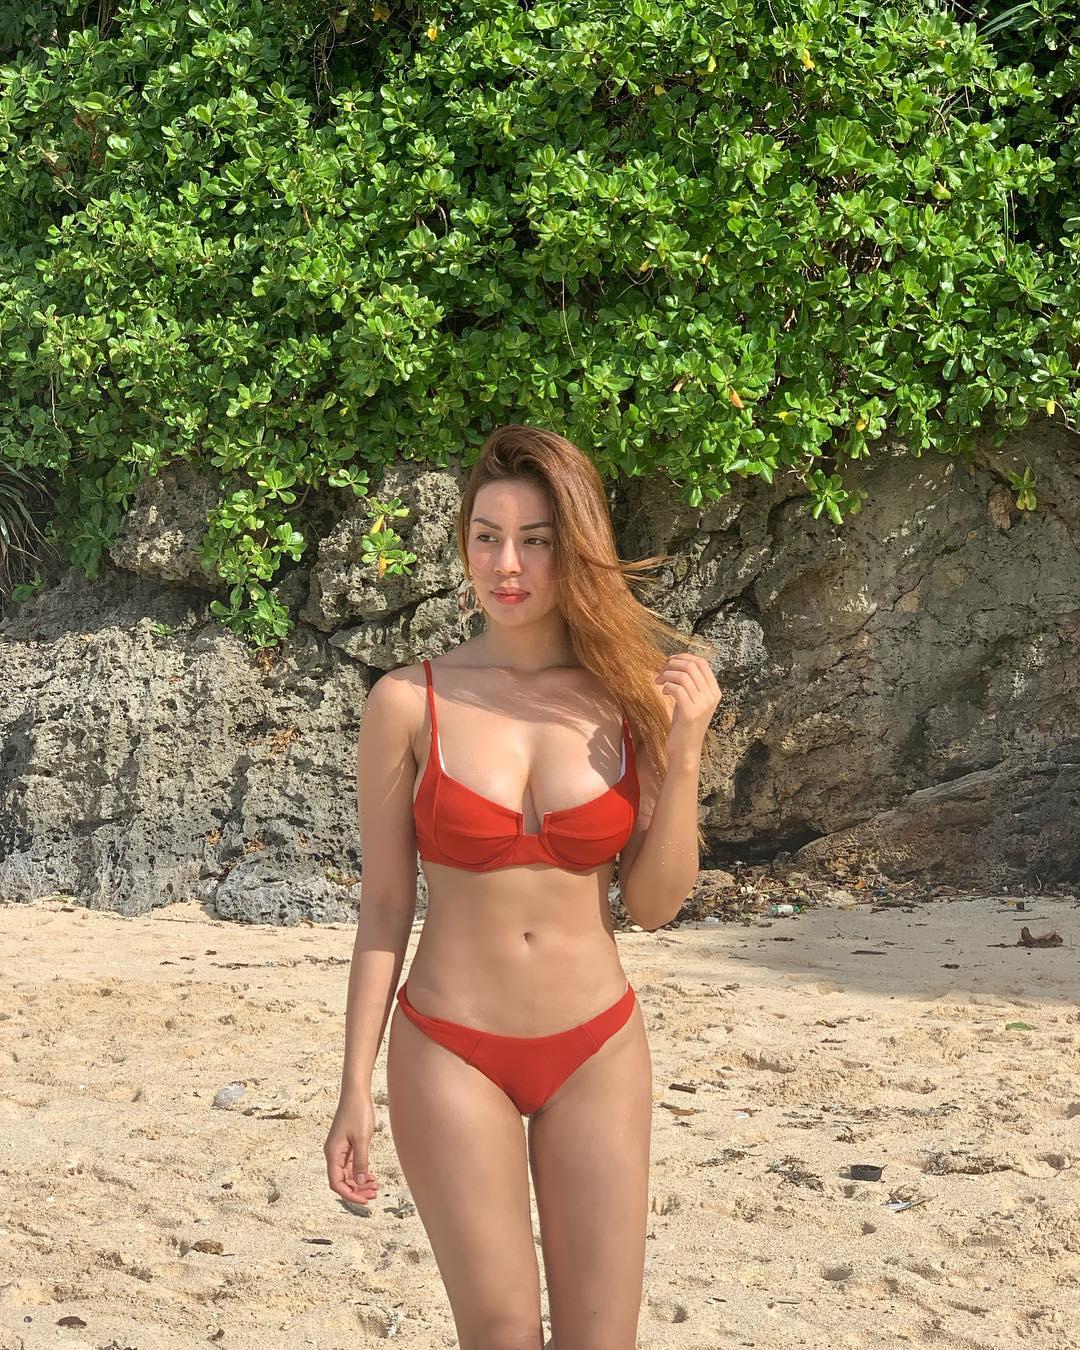 maica palo sexy bikini pics 03